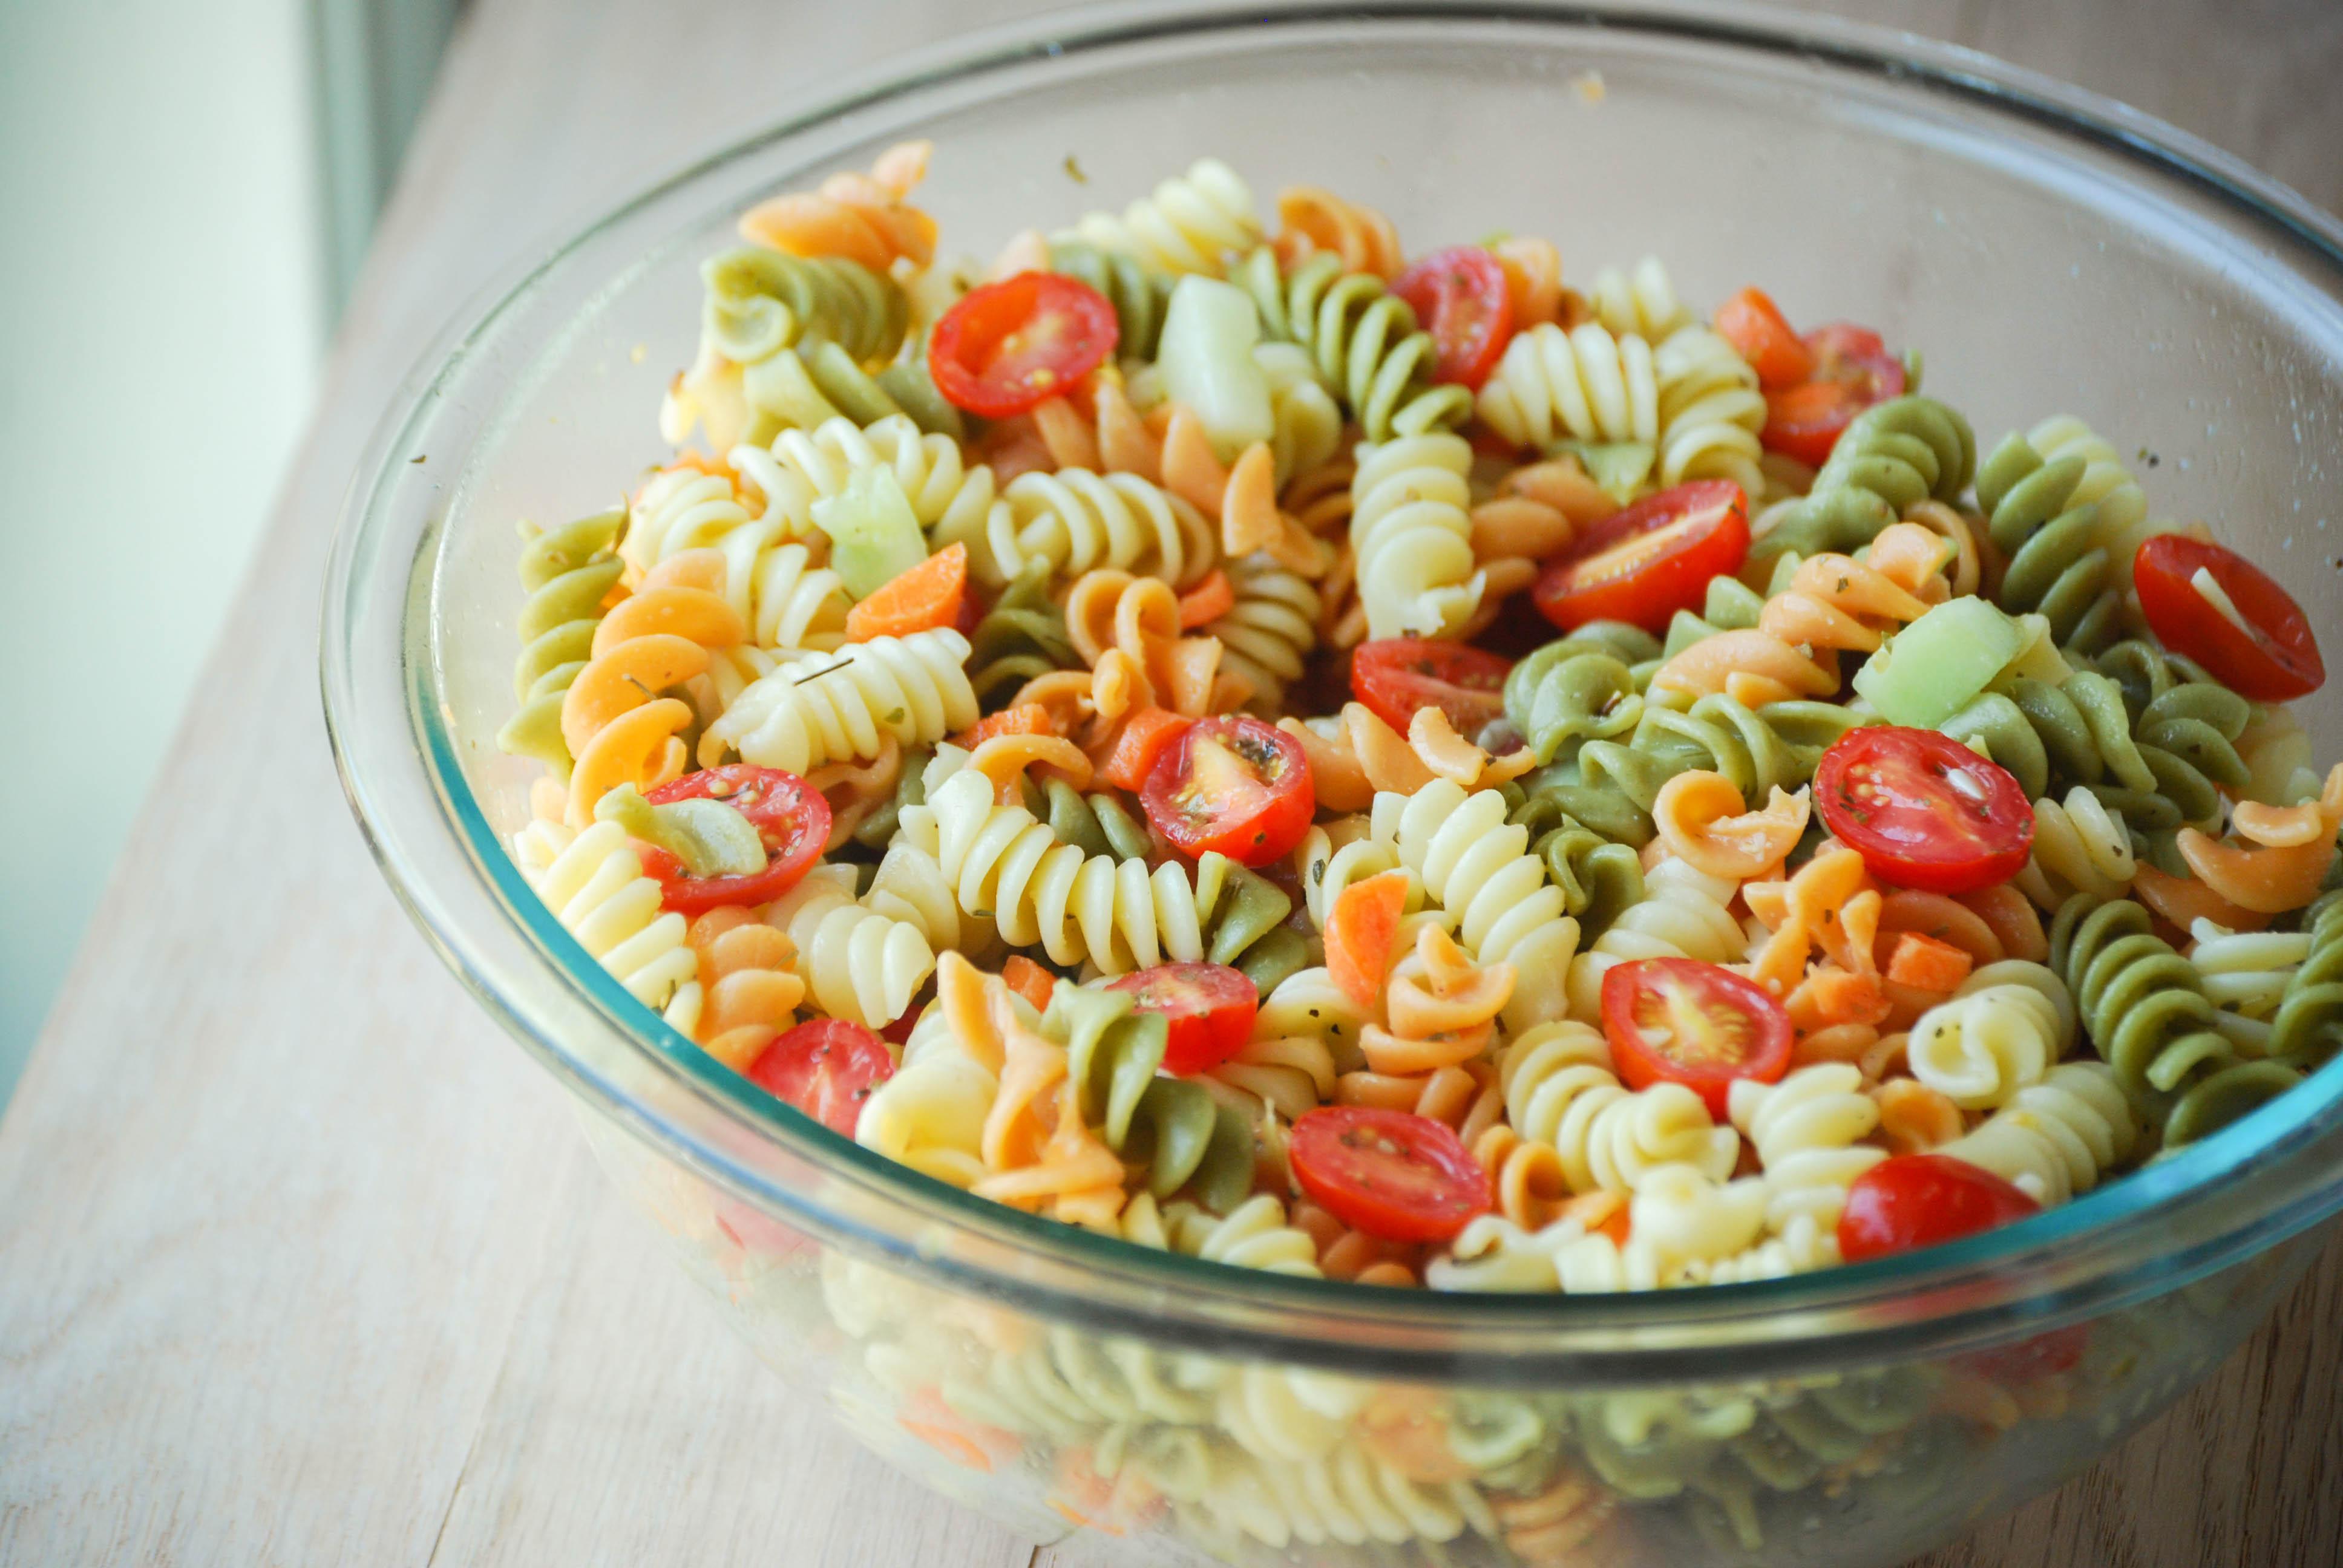 Classic Pasta Salad - Macaroni and Cheesecake